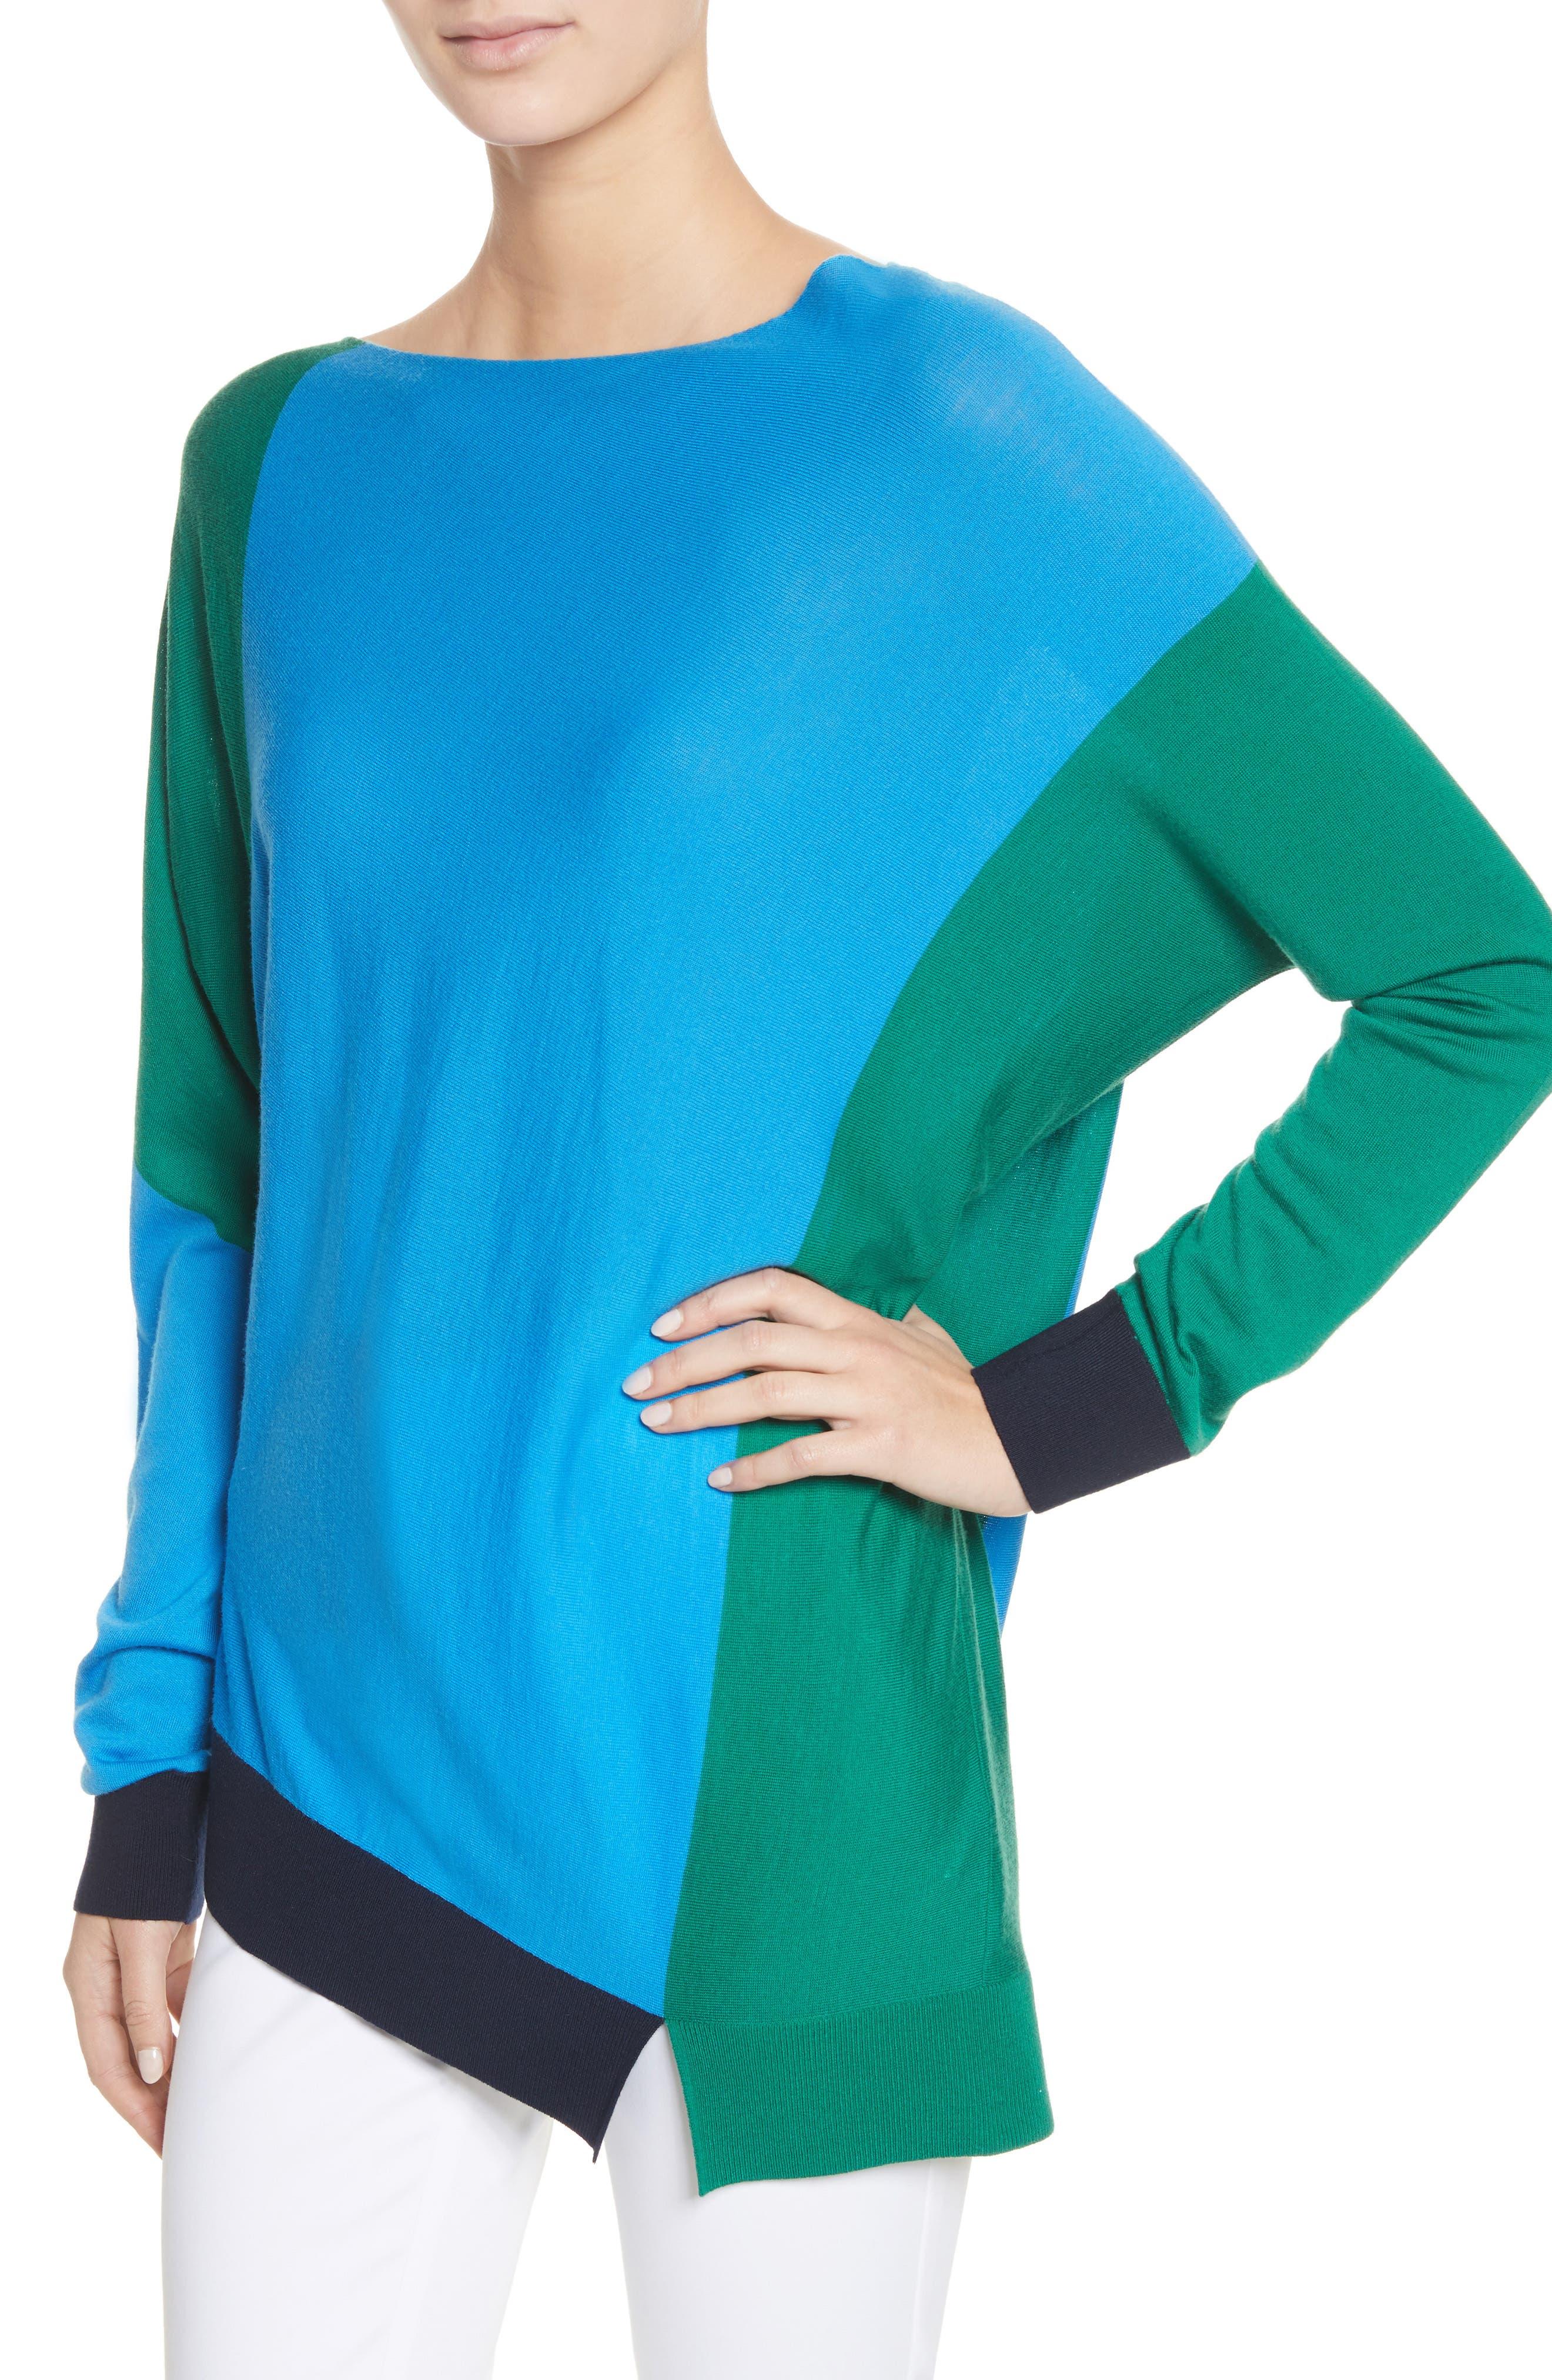 Colorblock Knit Wool Sweater,                             Alternate thumbnail 4, color,                             Cyan/ Emerald/ Navy